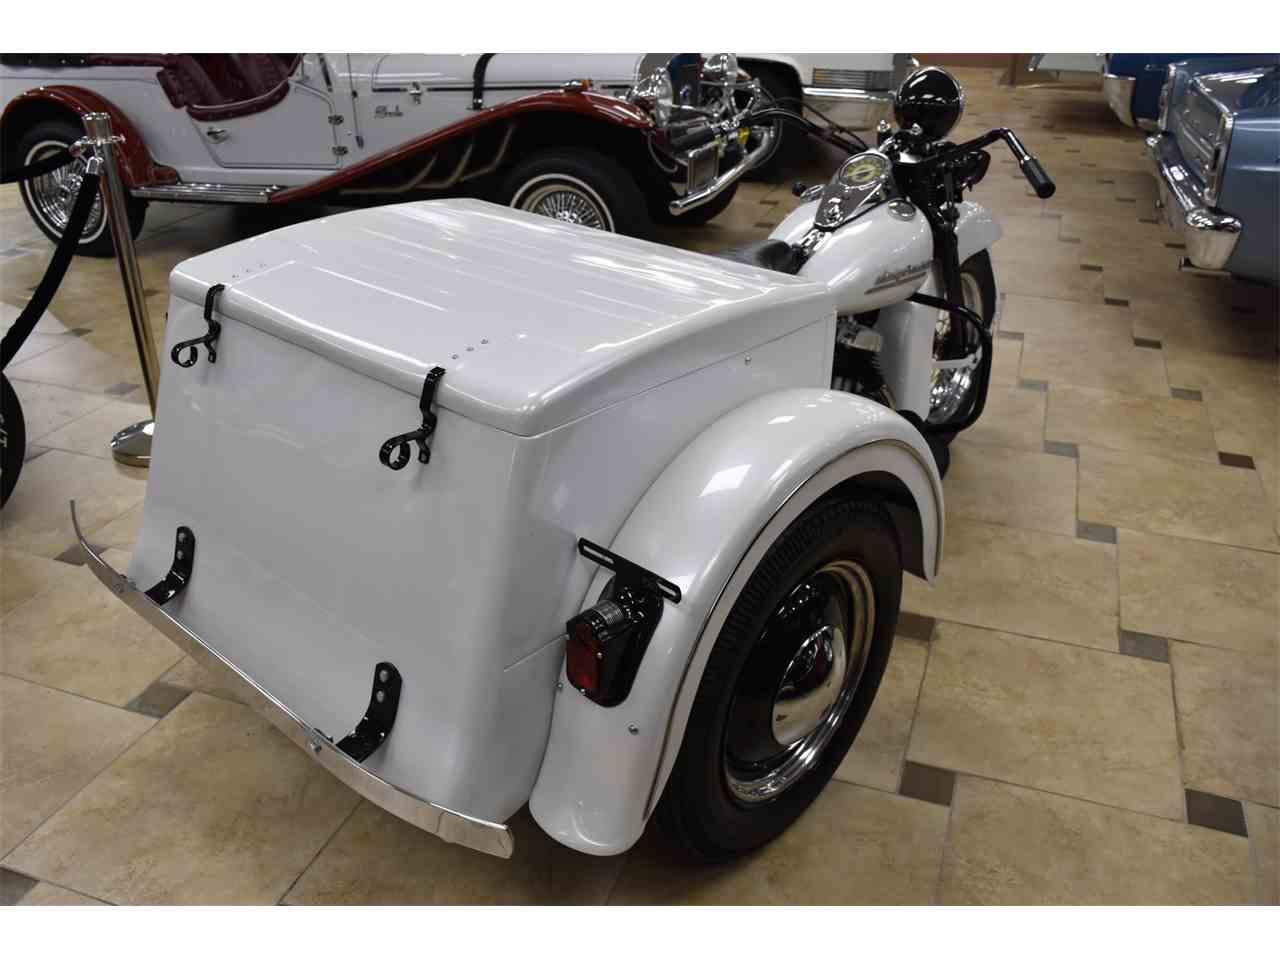 1952 Harley-Davidson Servi-Car for Sale | ClassicCars.com | CC-1031362